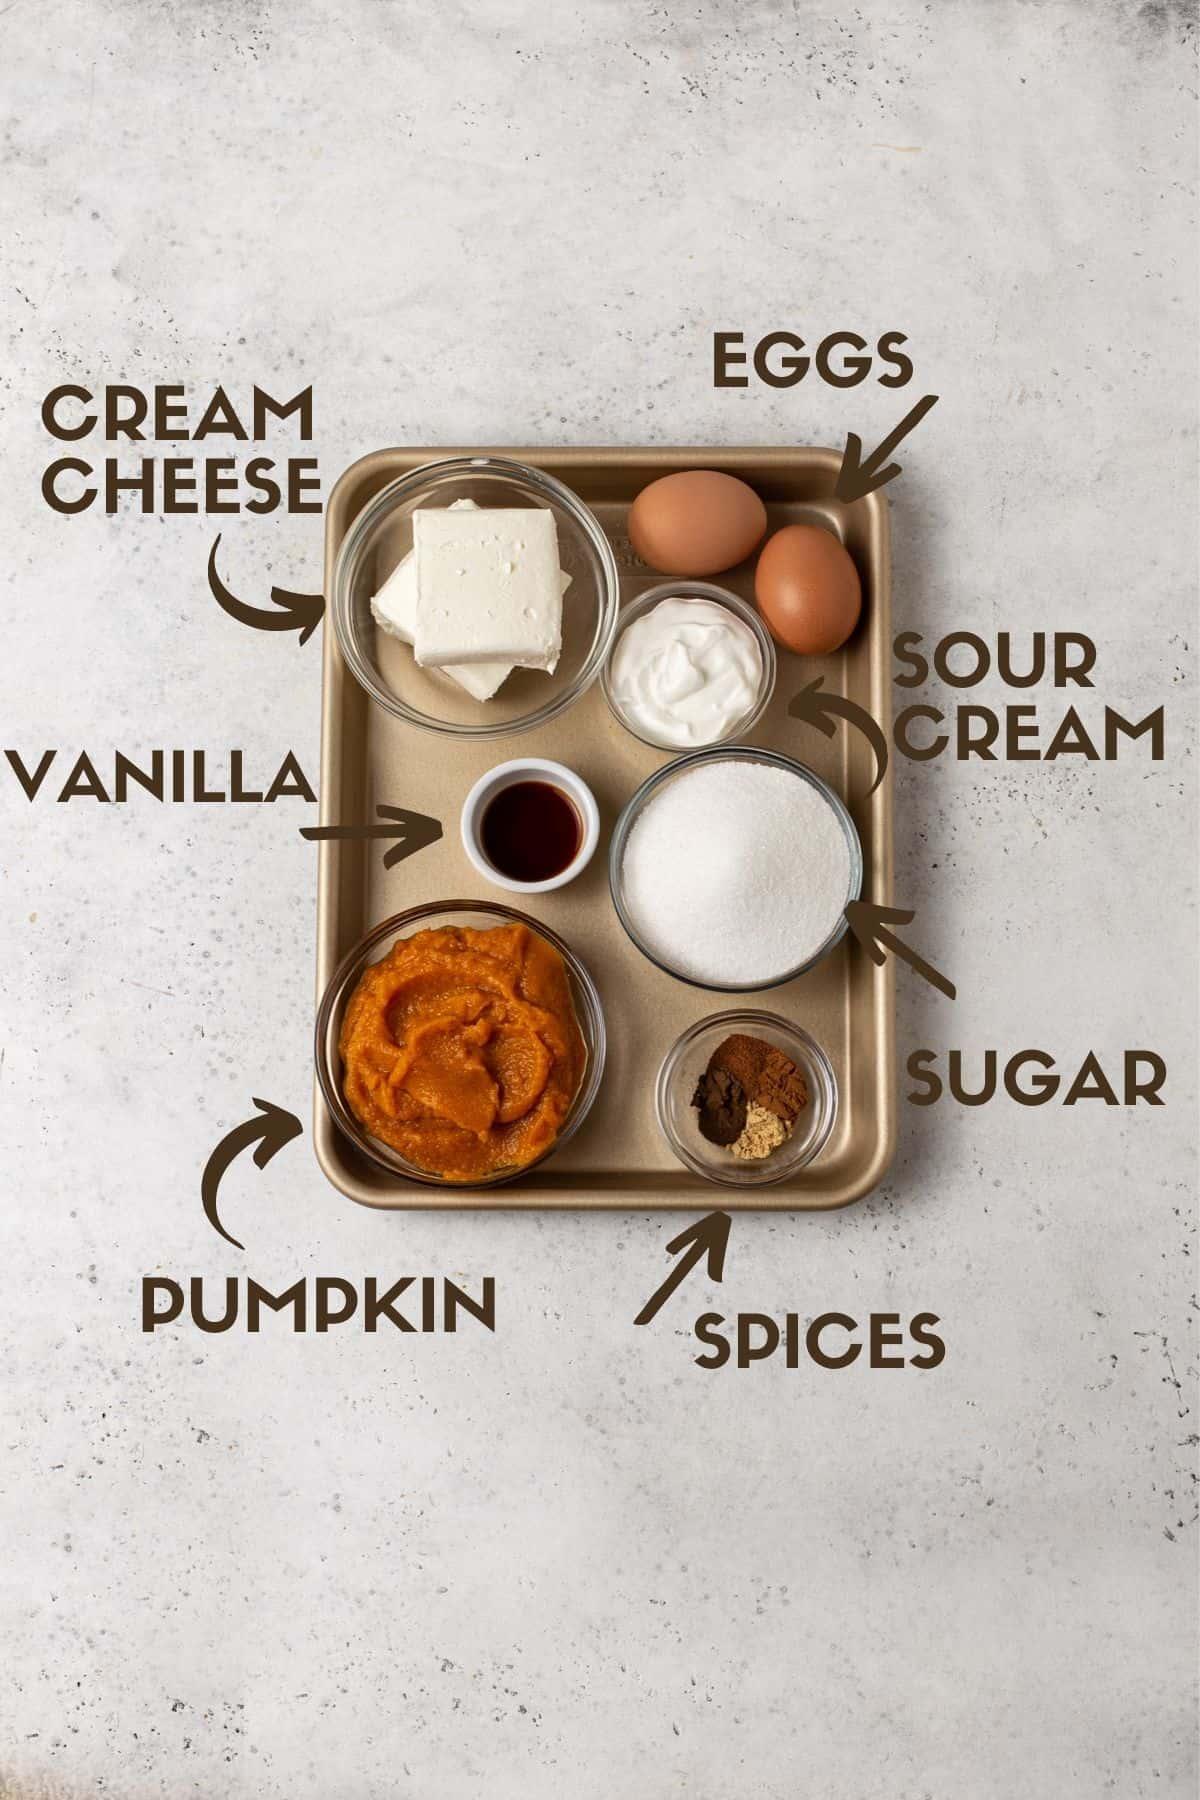 Ingredients for pumpkin cheesecake pie including pumpkin puree, sugar, cream cheese, eggs, spices & sour cream.